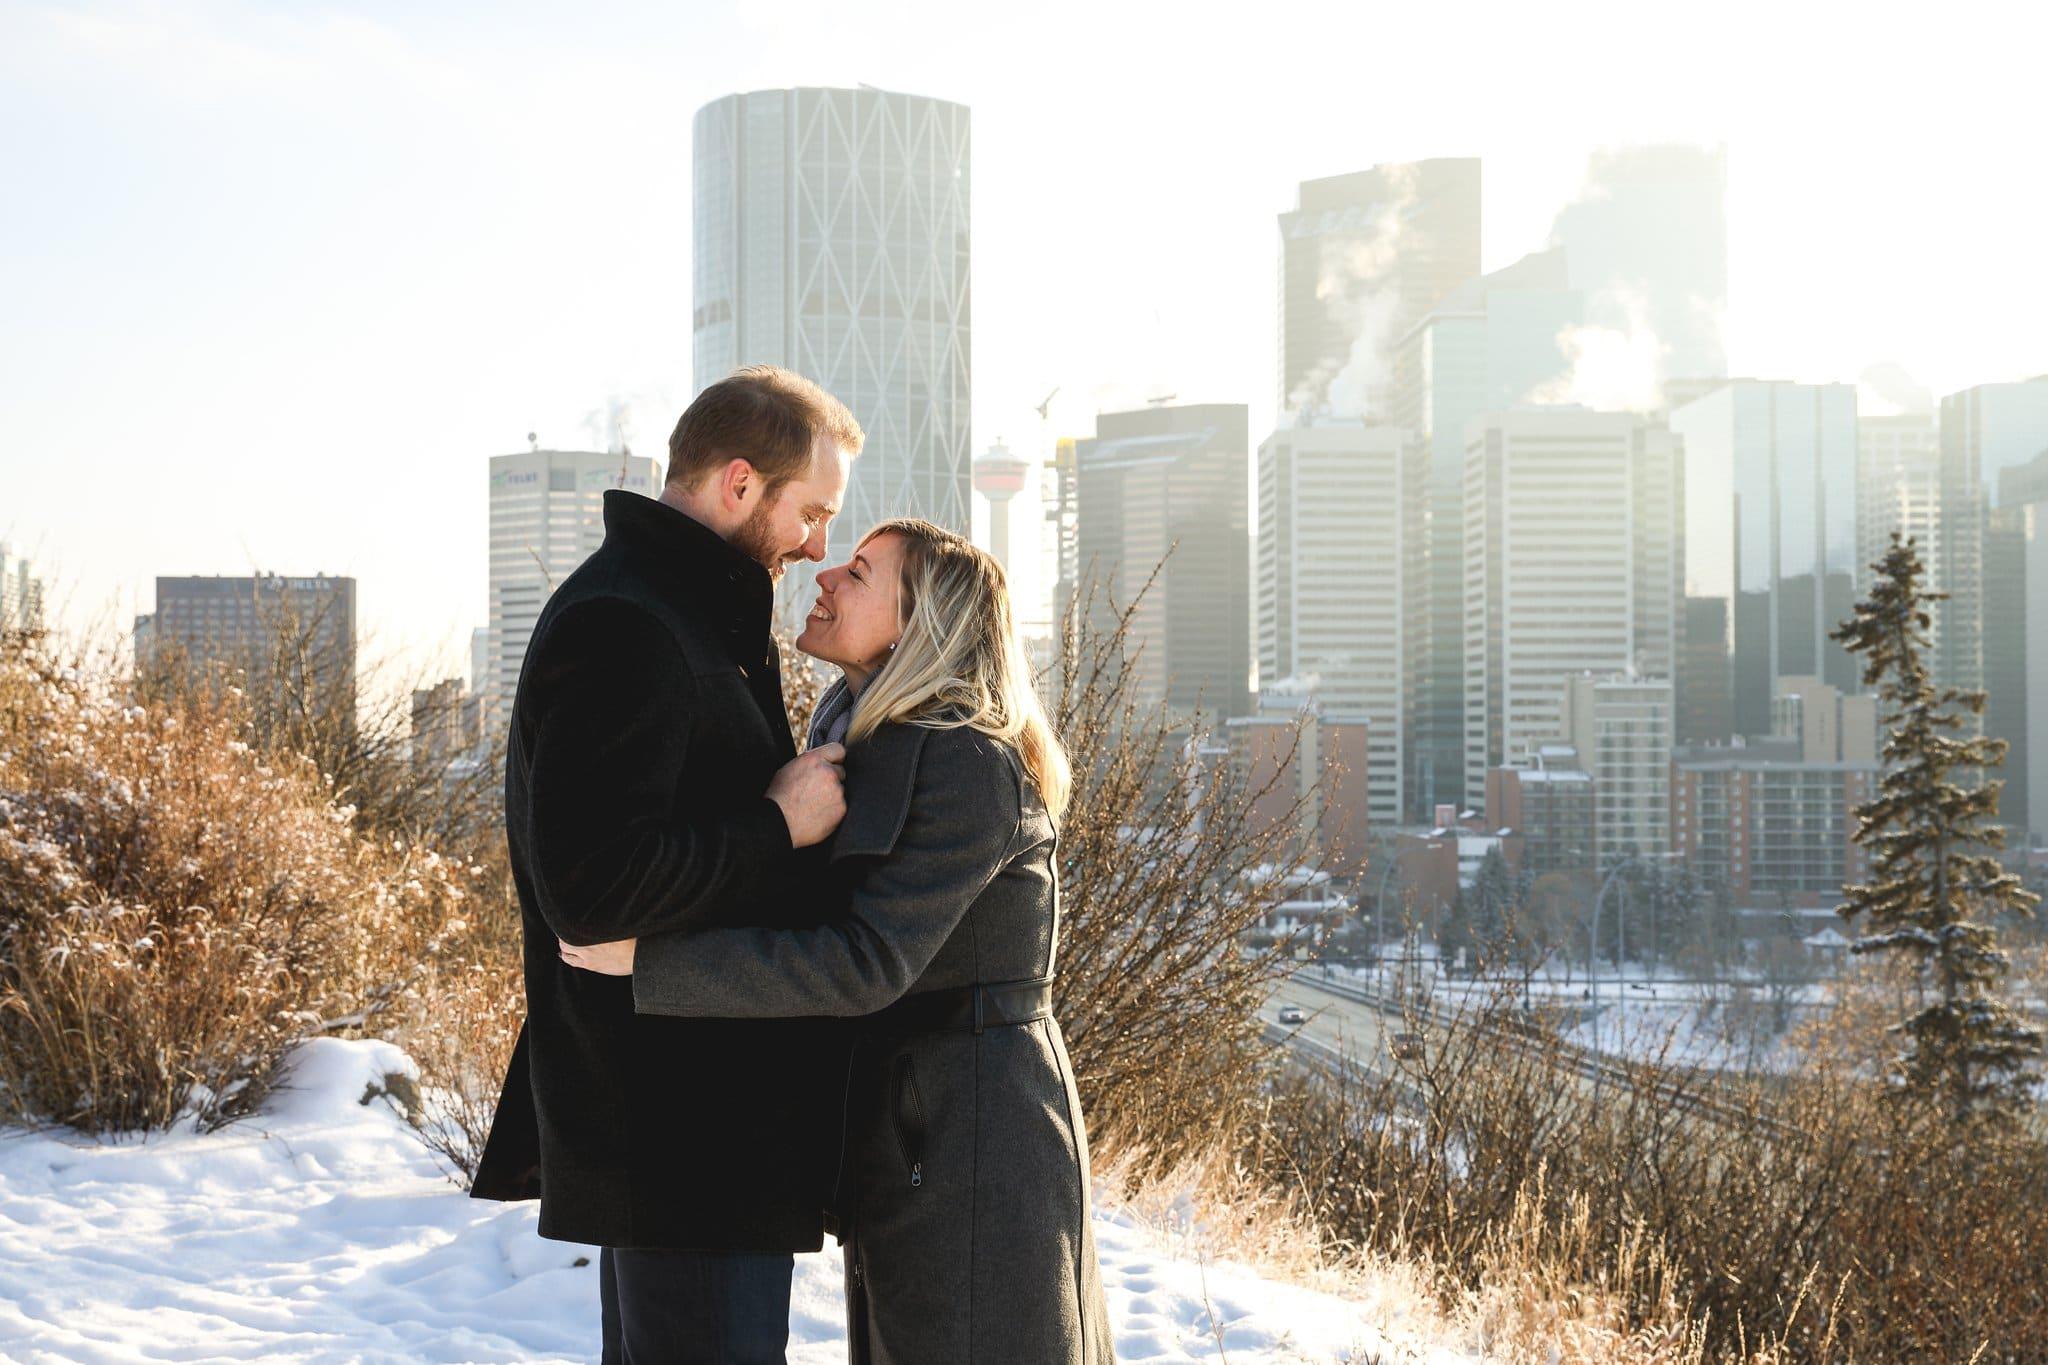 Ashley Daphne Photography Calgary Couple Wedding Photographer Engagement Photos Proposal Photos_0030.jpg